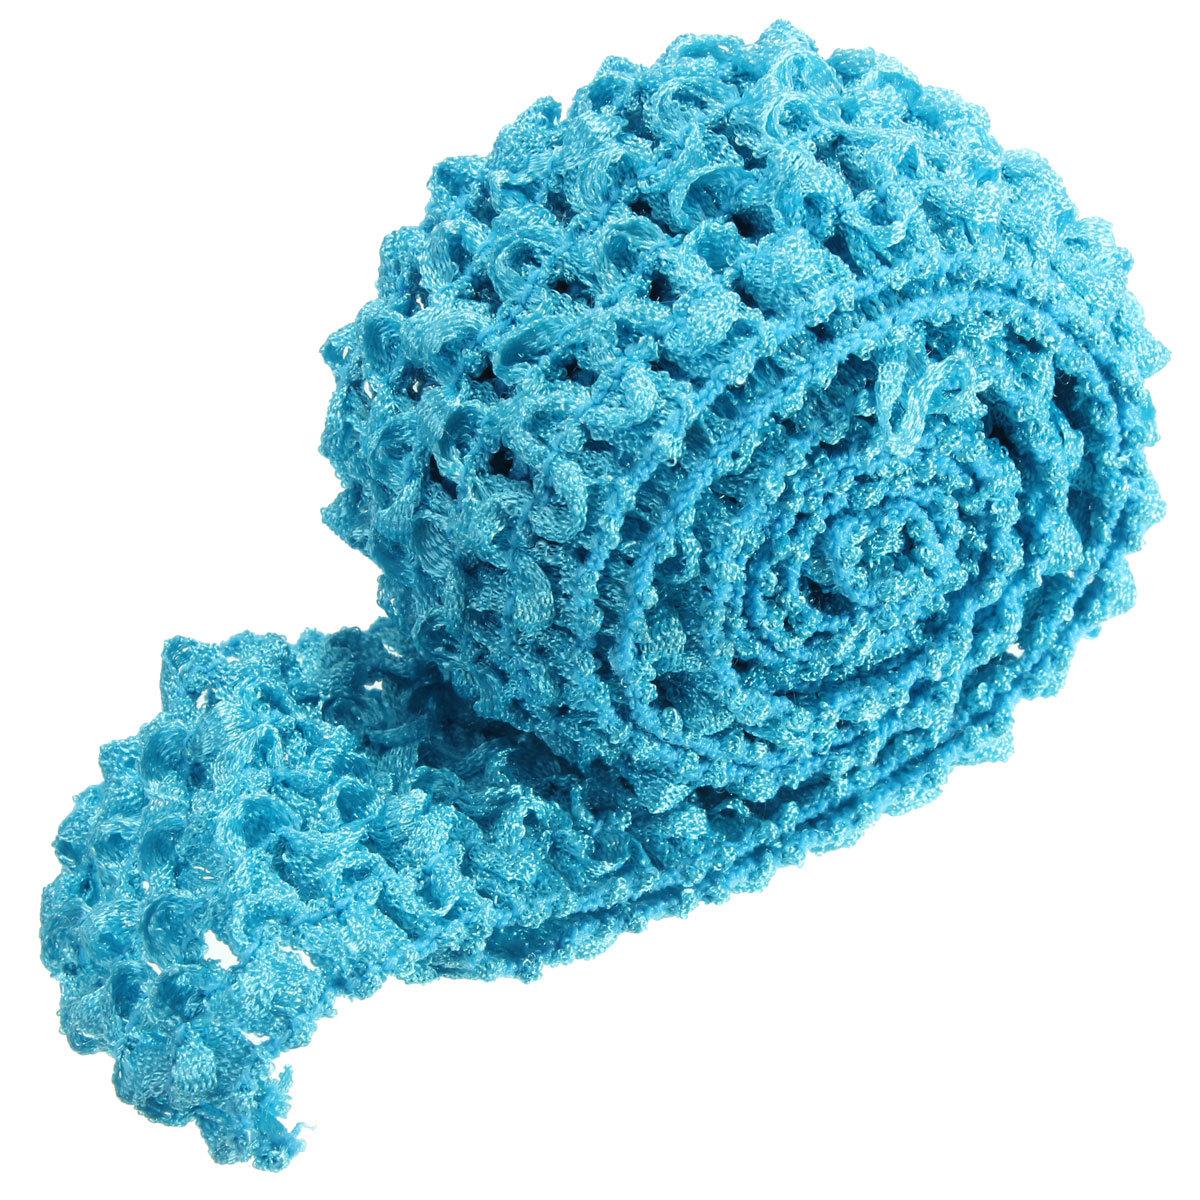 Crochet Elastic Hair Band : ... -Crochet-Tube-Top-Elastic-Waistband-HeadBand-Tutu-Hair-Band-Skirt-DIY